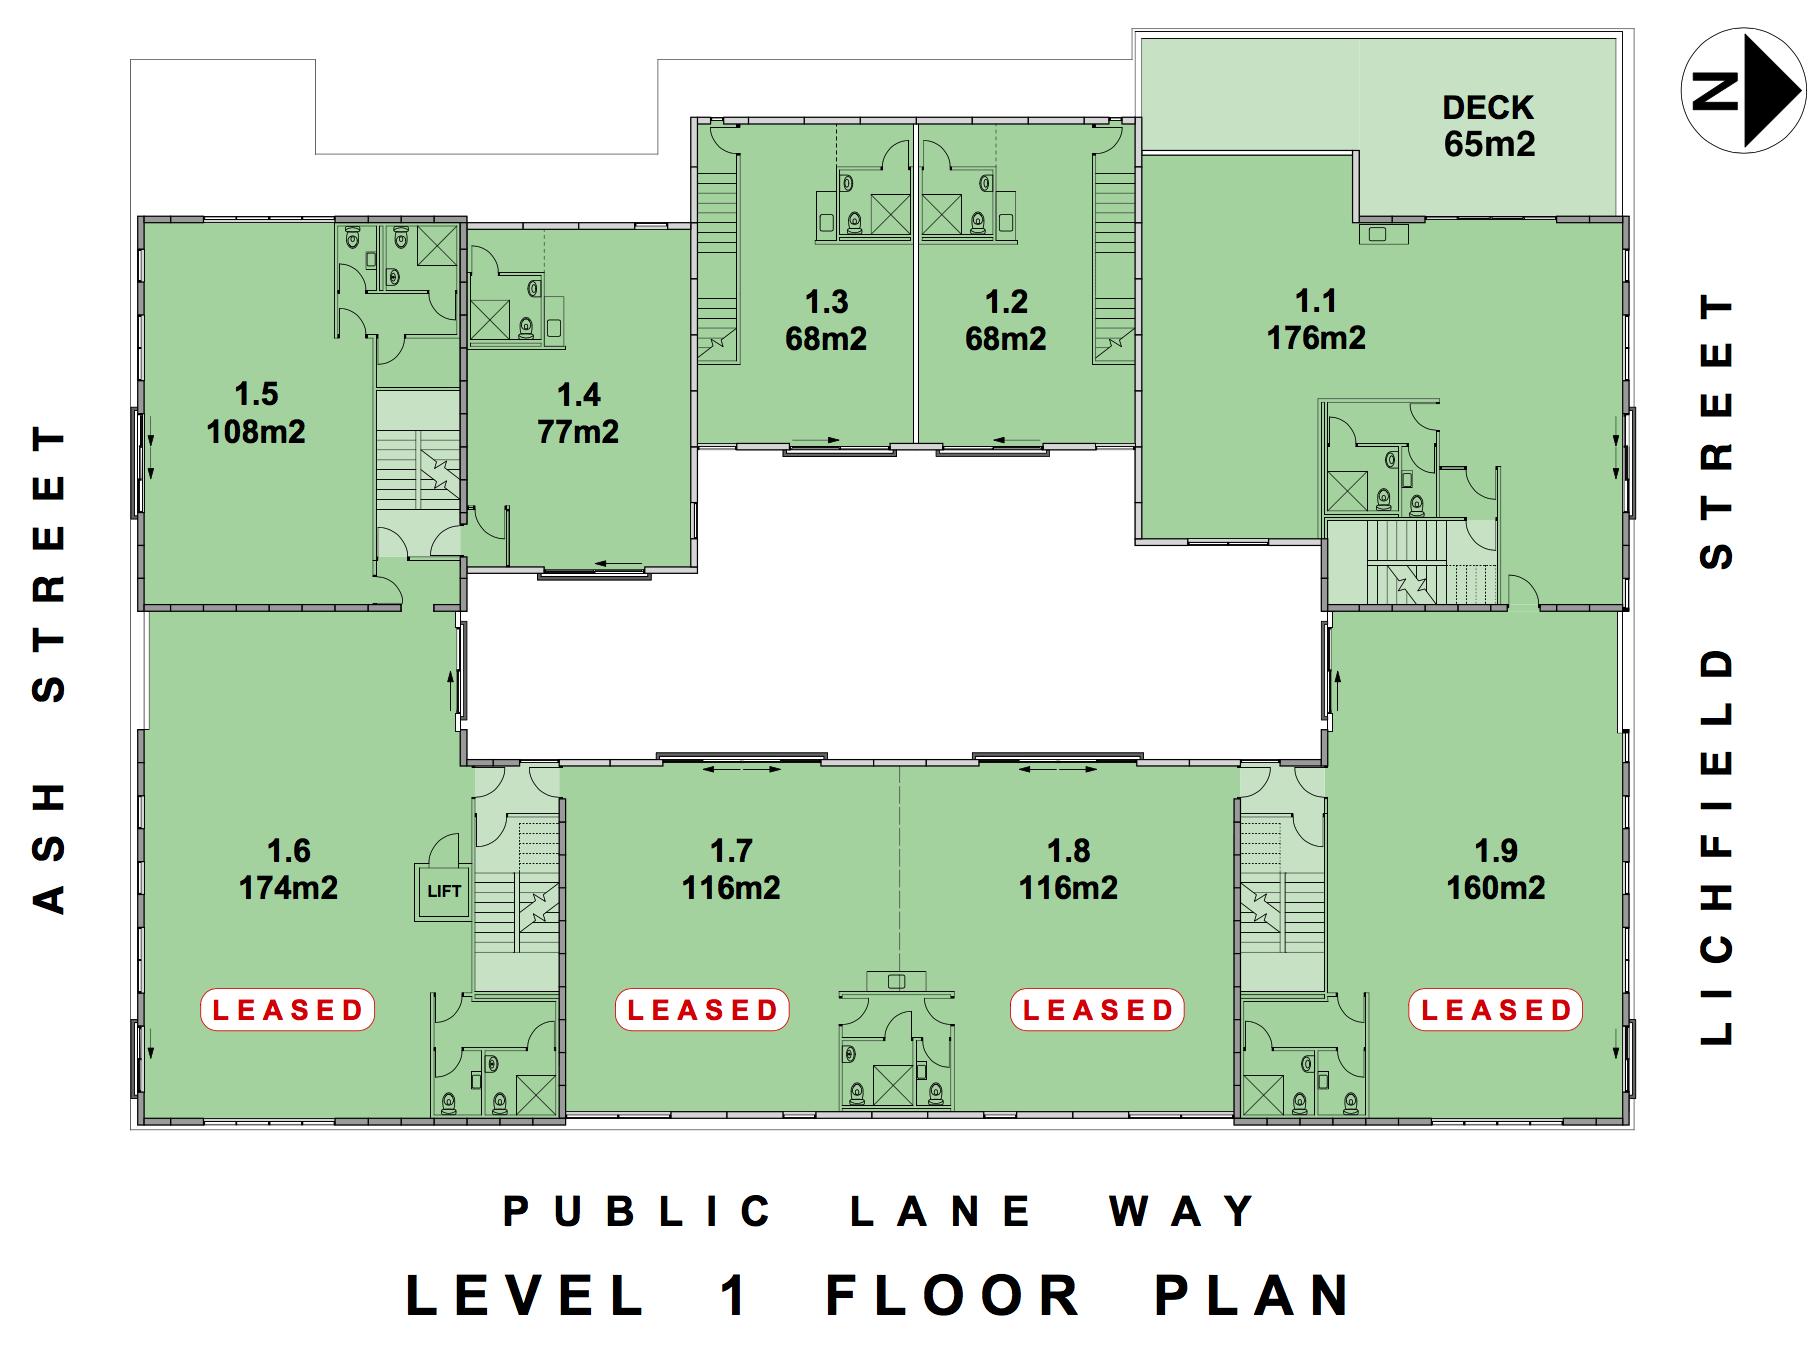 150 lichfield studio d4 23 1st floor plan malvernweather Image collections